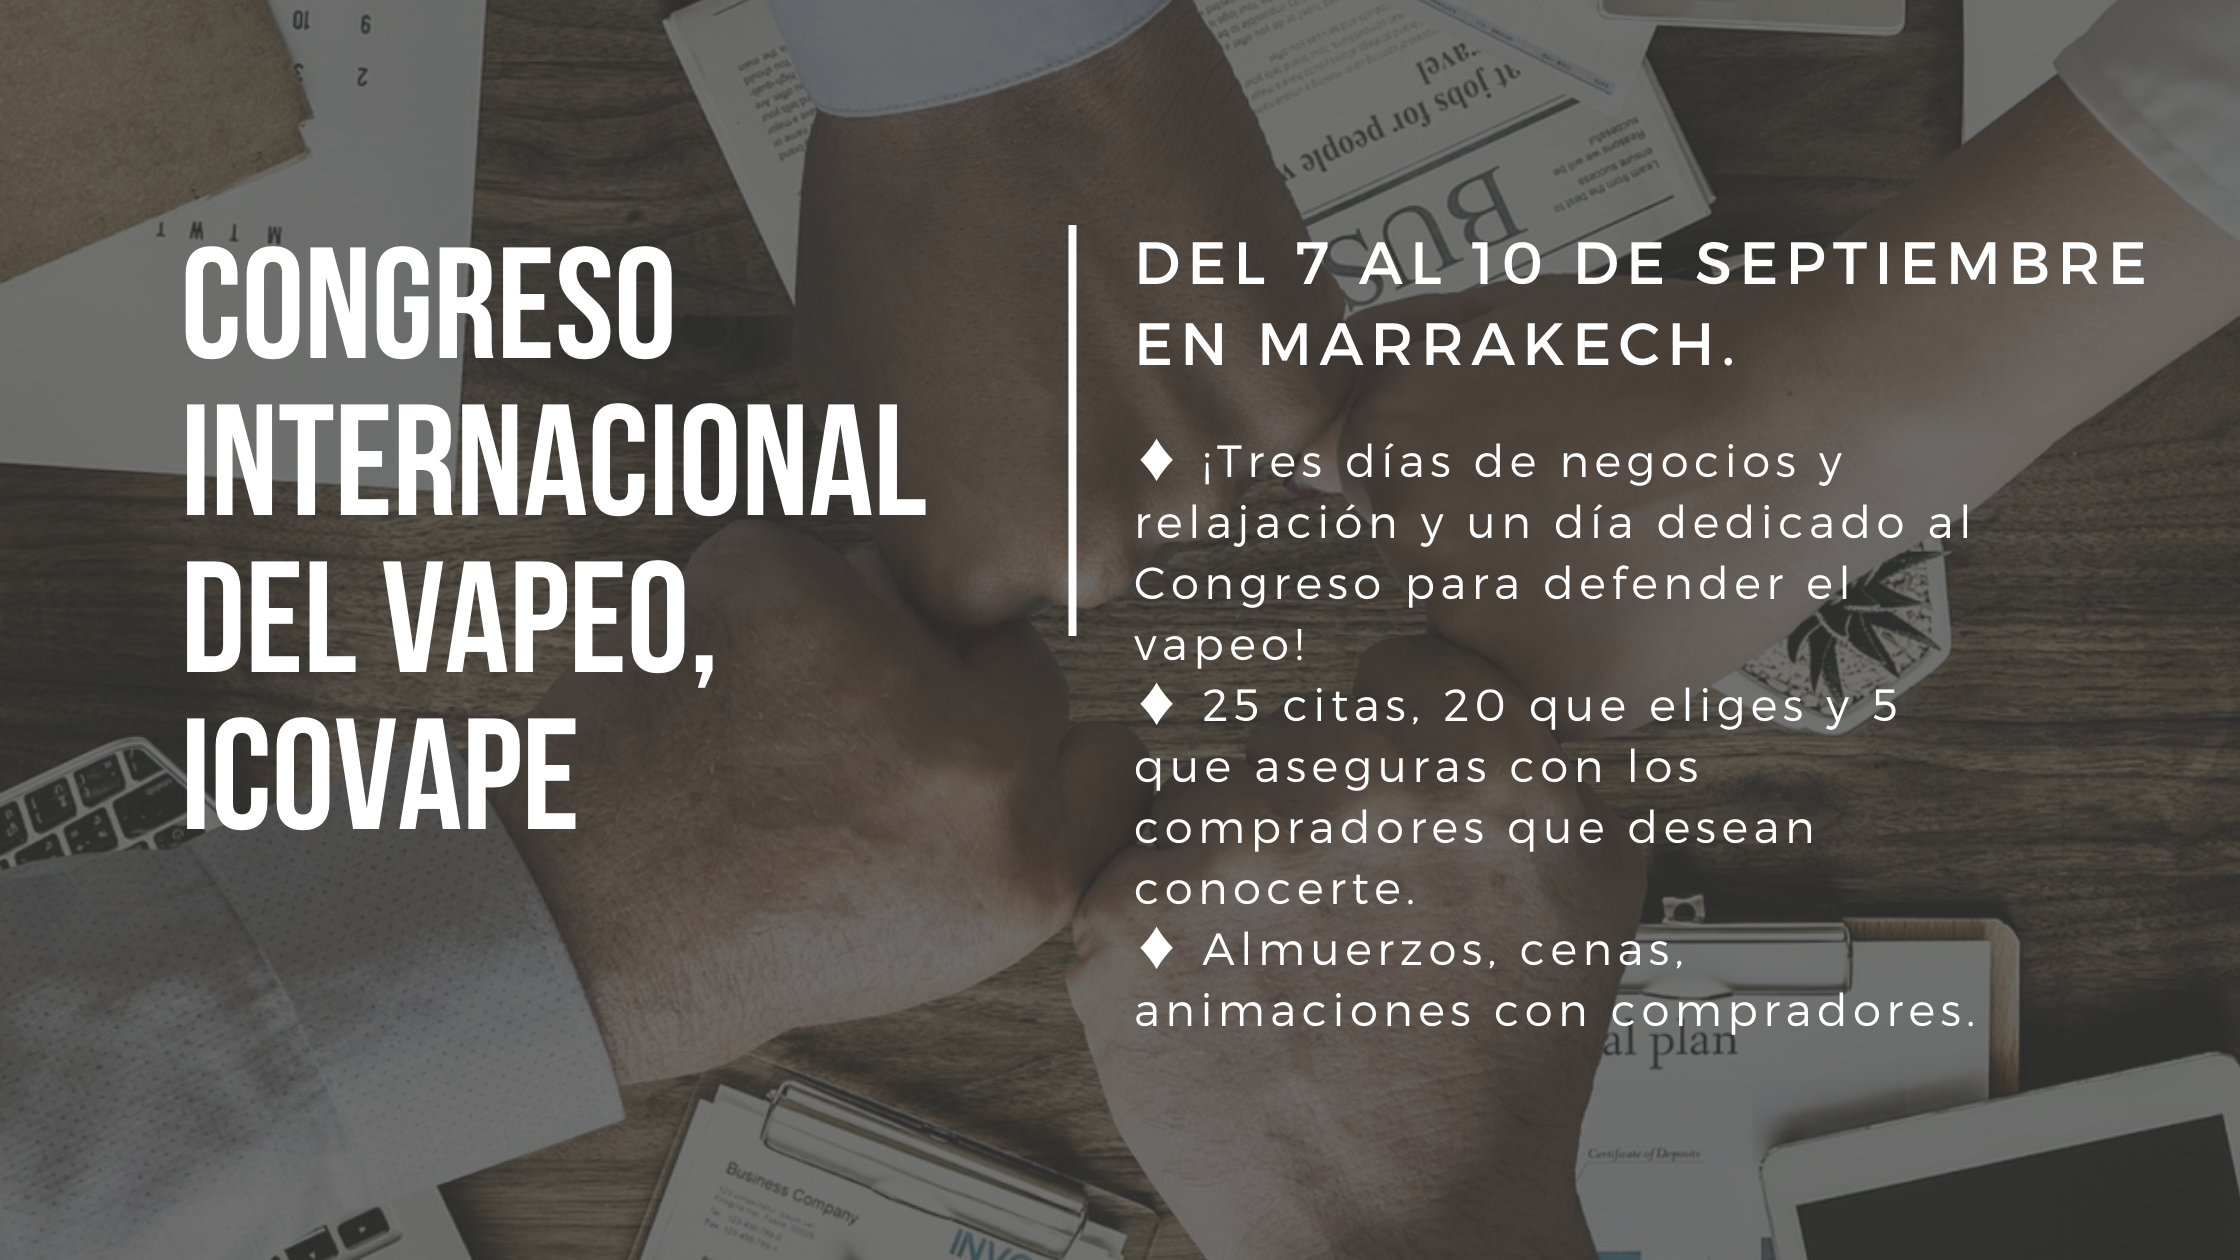 Congreso internacional del vapeo, Icovape